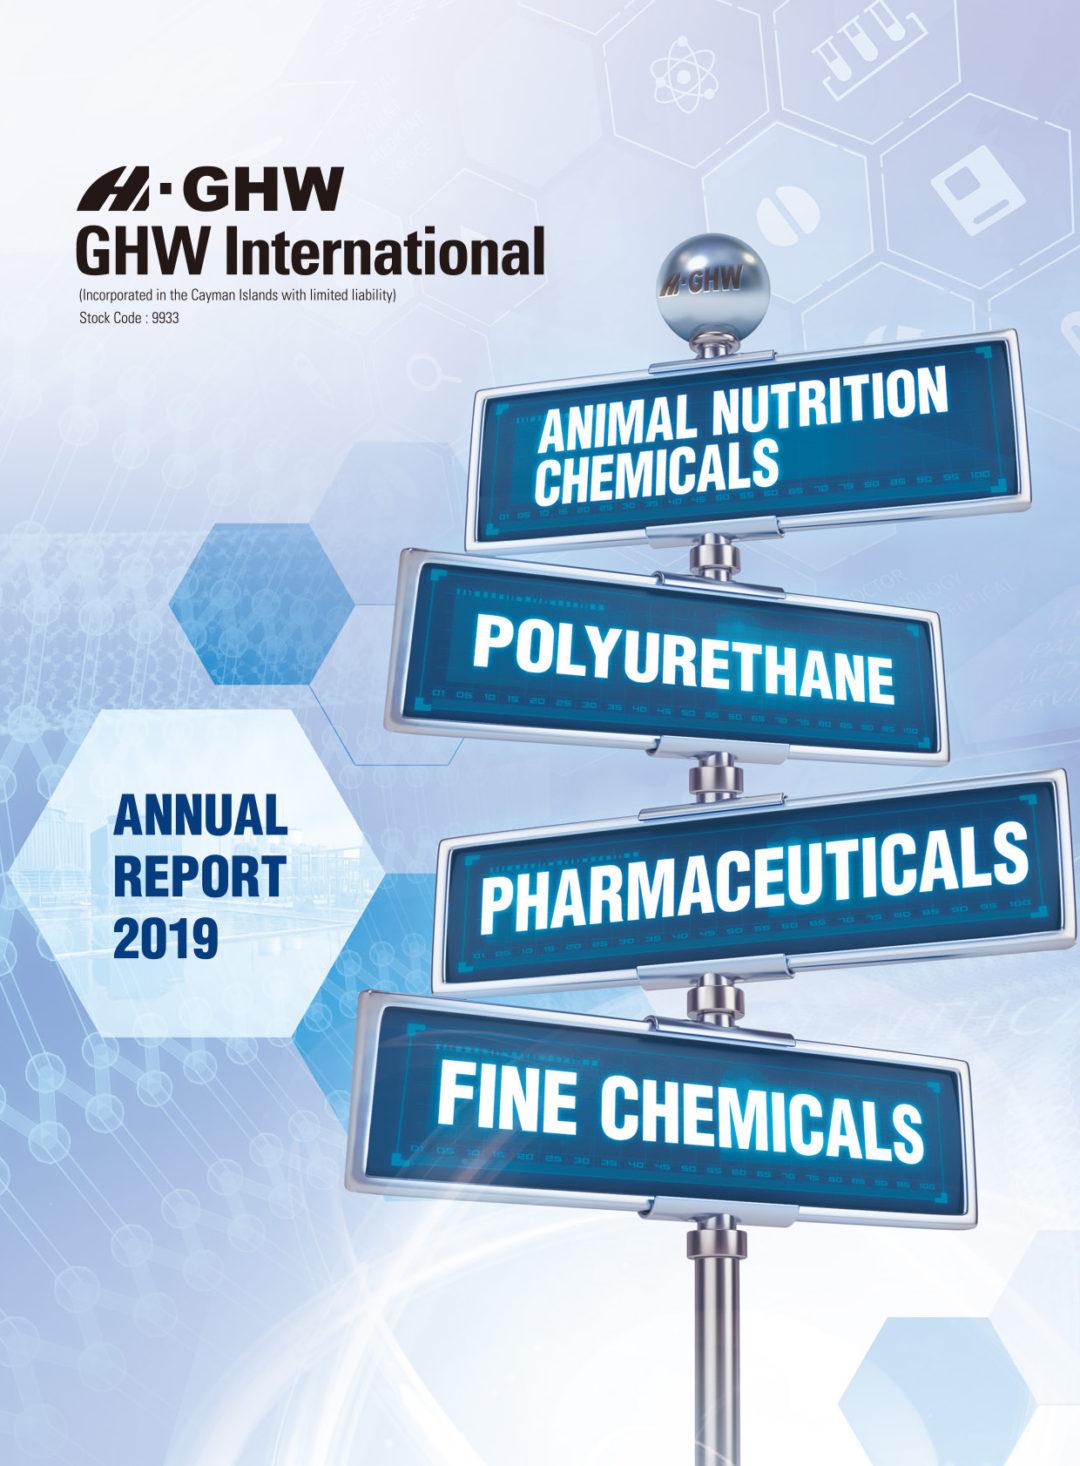 GHW International